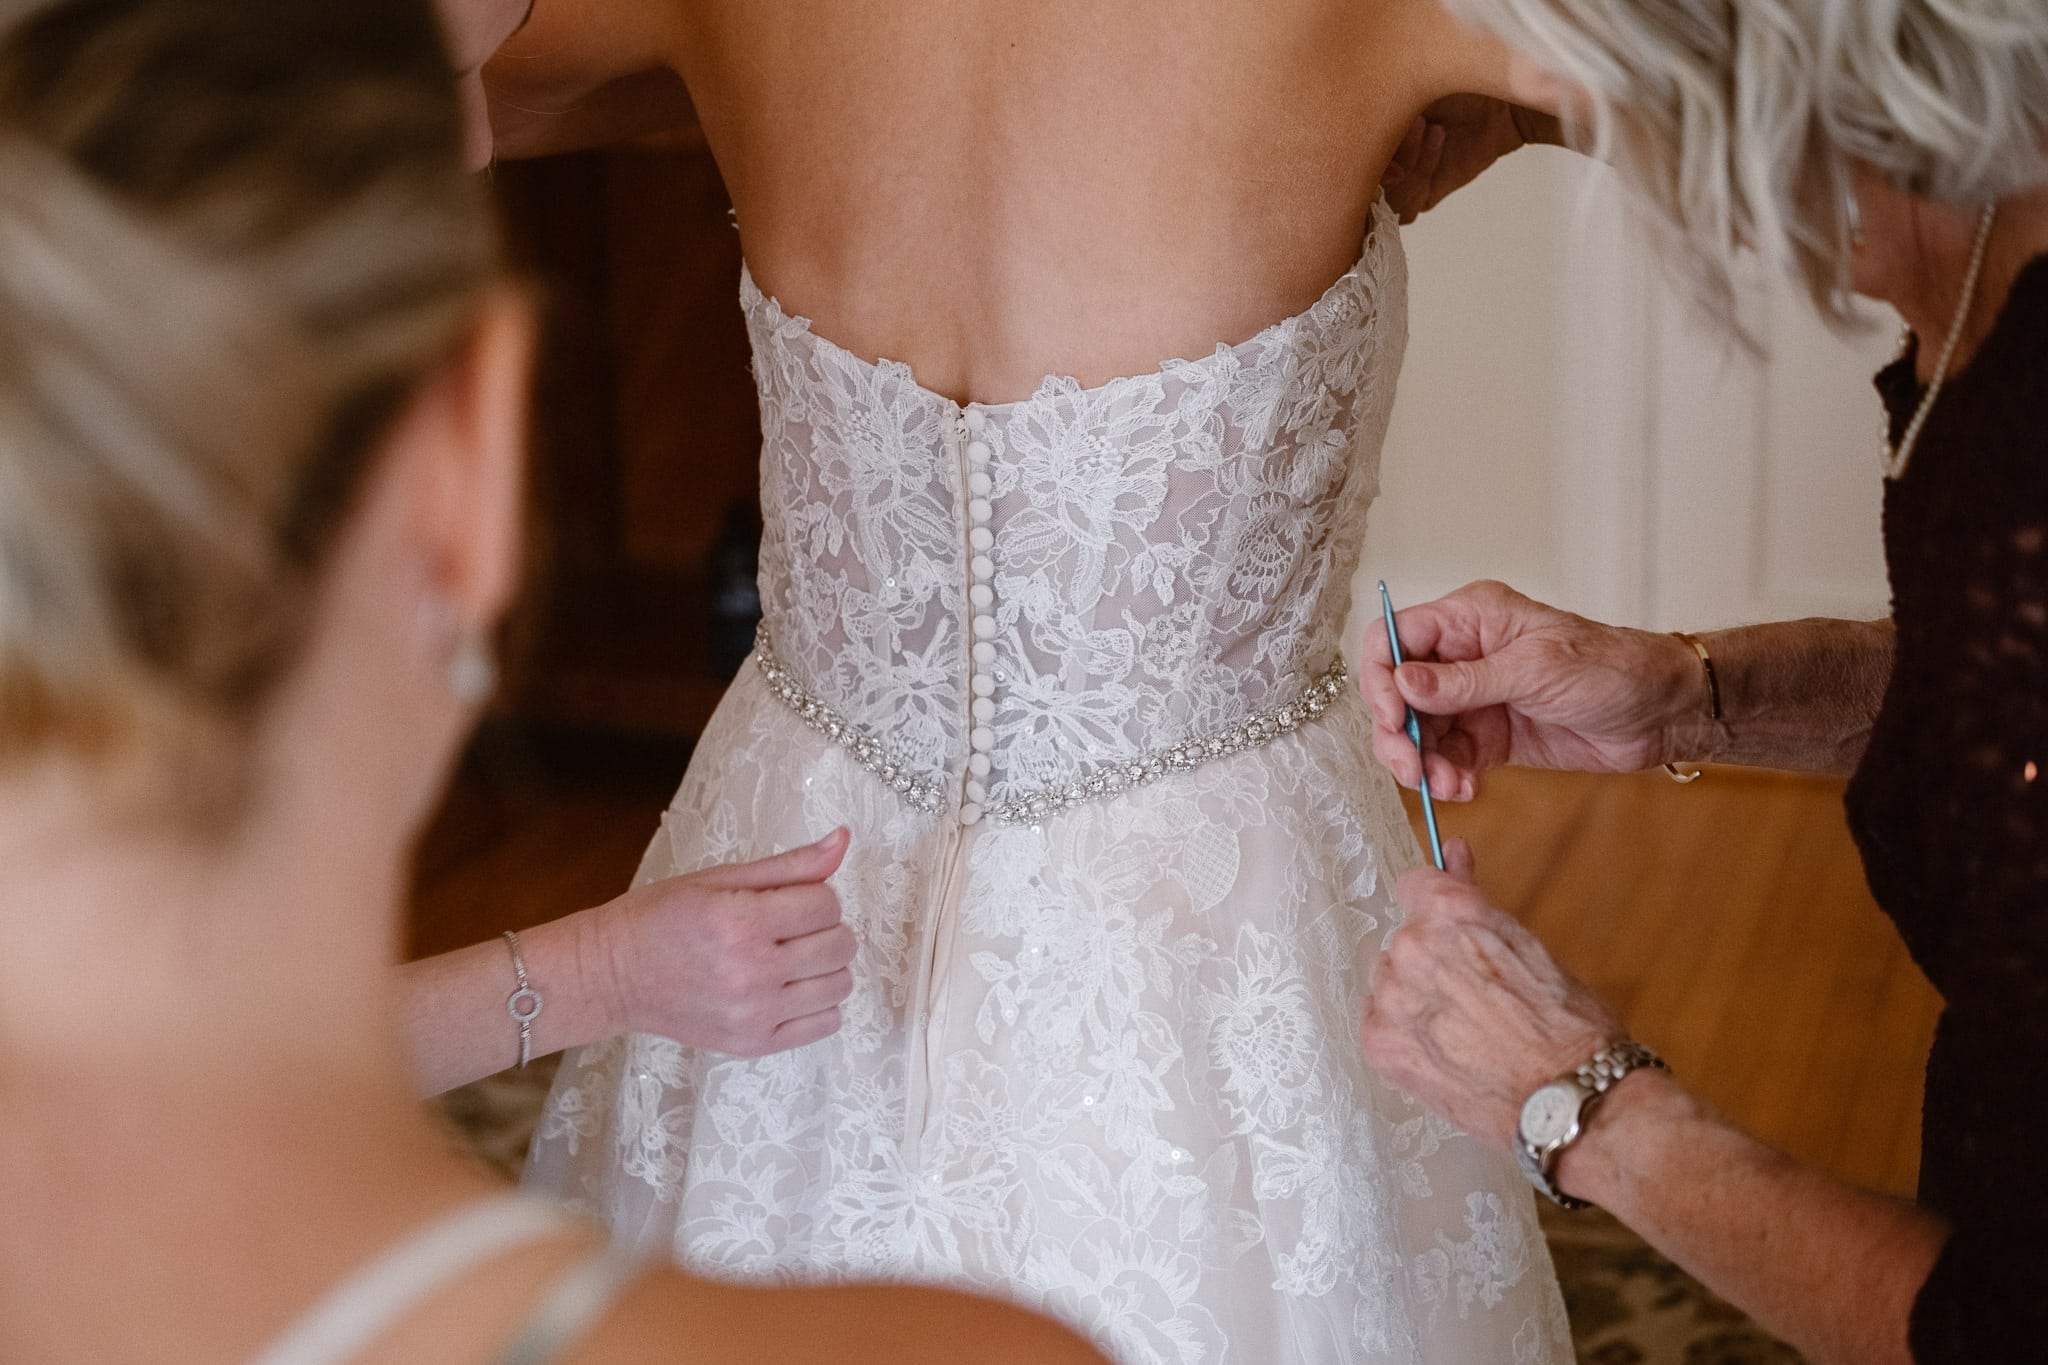 Grant Humphreys Mansion Wedding Photographer, Denver wedding photographer, Colorado wedding photographer, bride getting ready